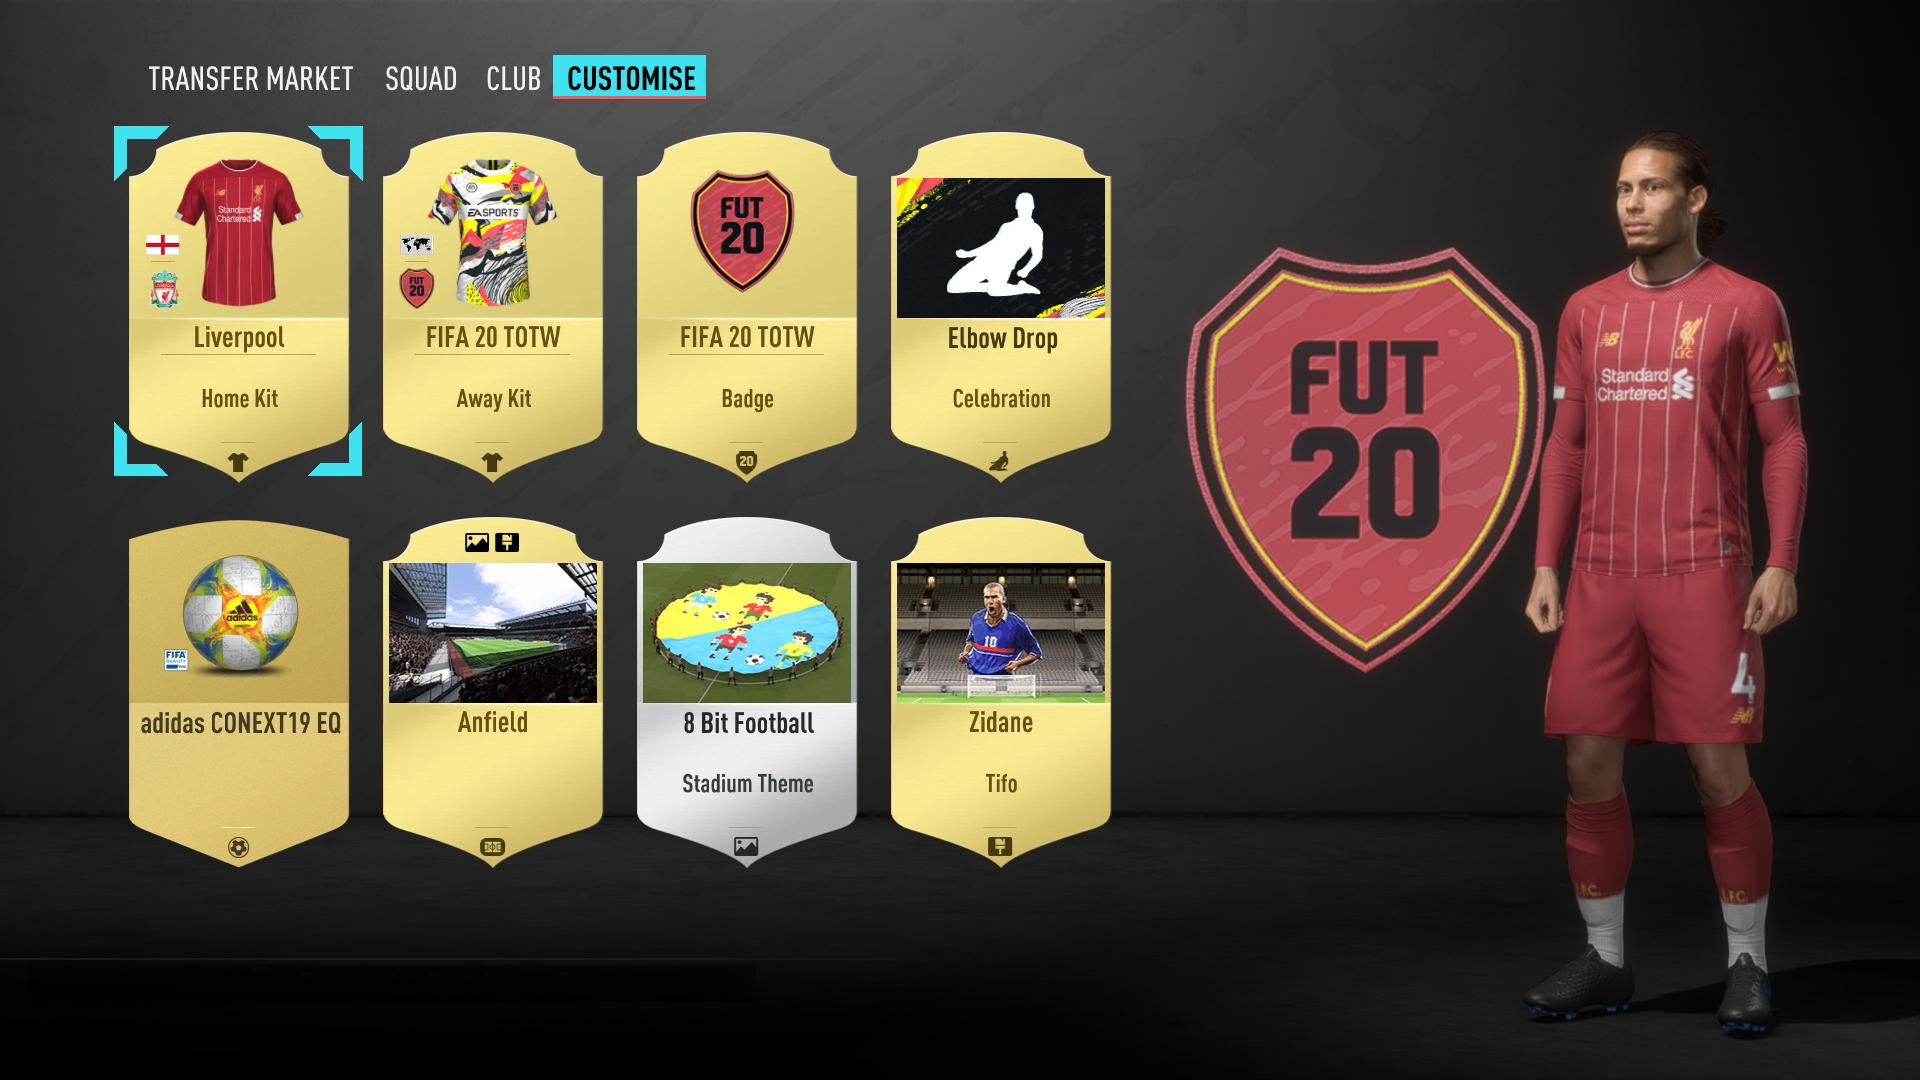 Customise Screen FIFA 20 Ultimate Team